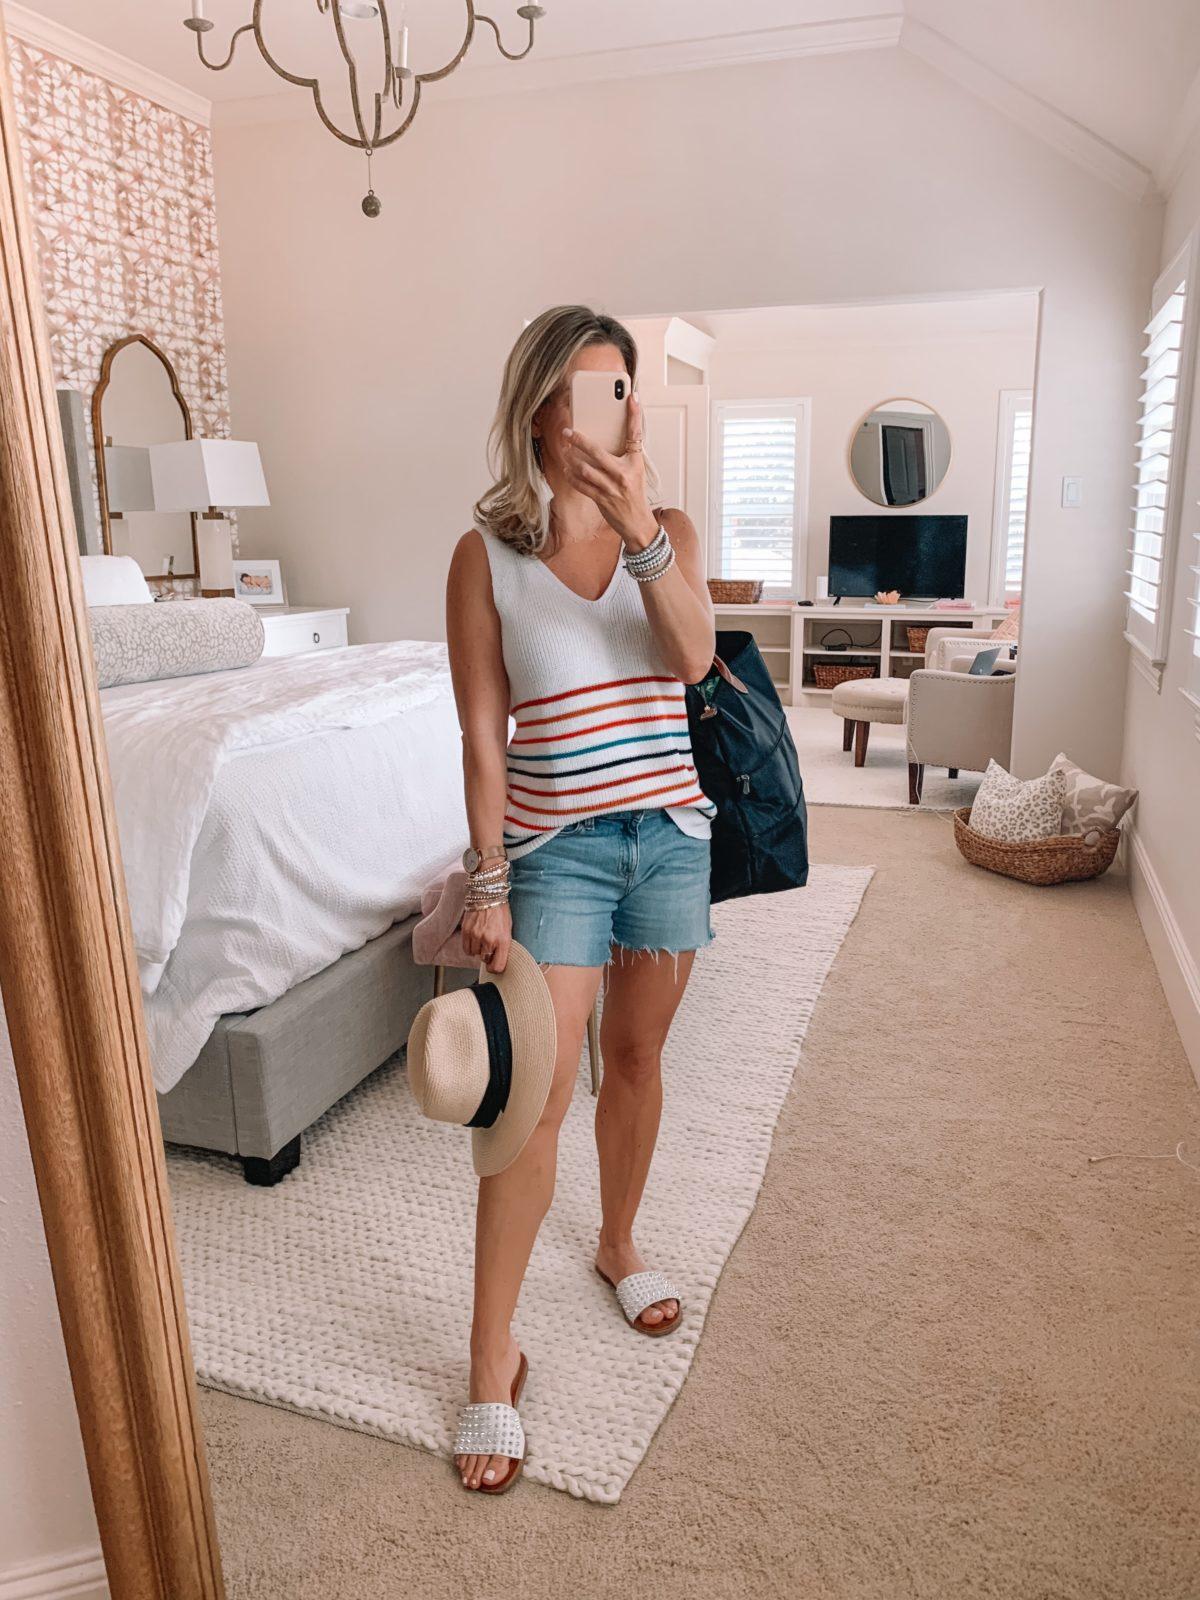 Amazon Fashion Finds, Striped Sweater Tank, Cut Off Shorts, Studded Slides, Hat